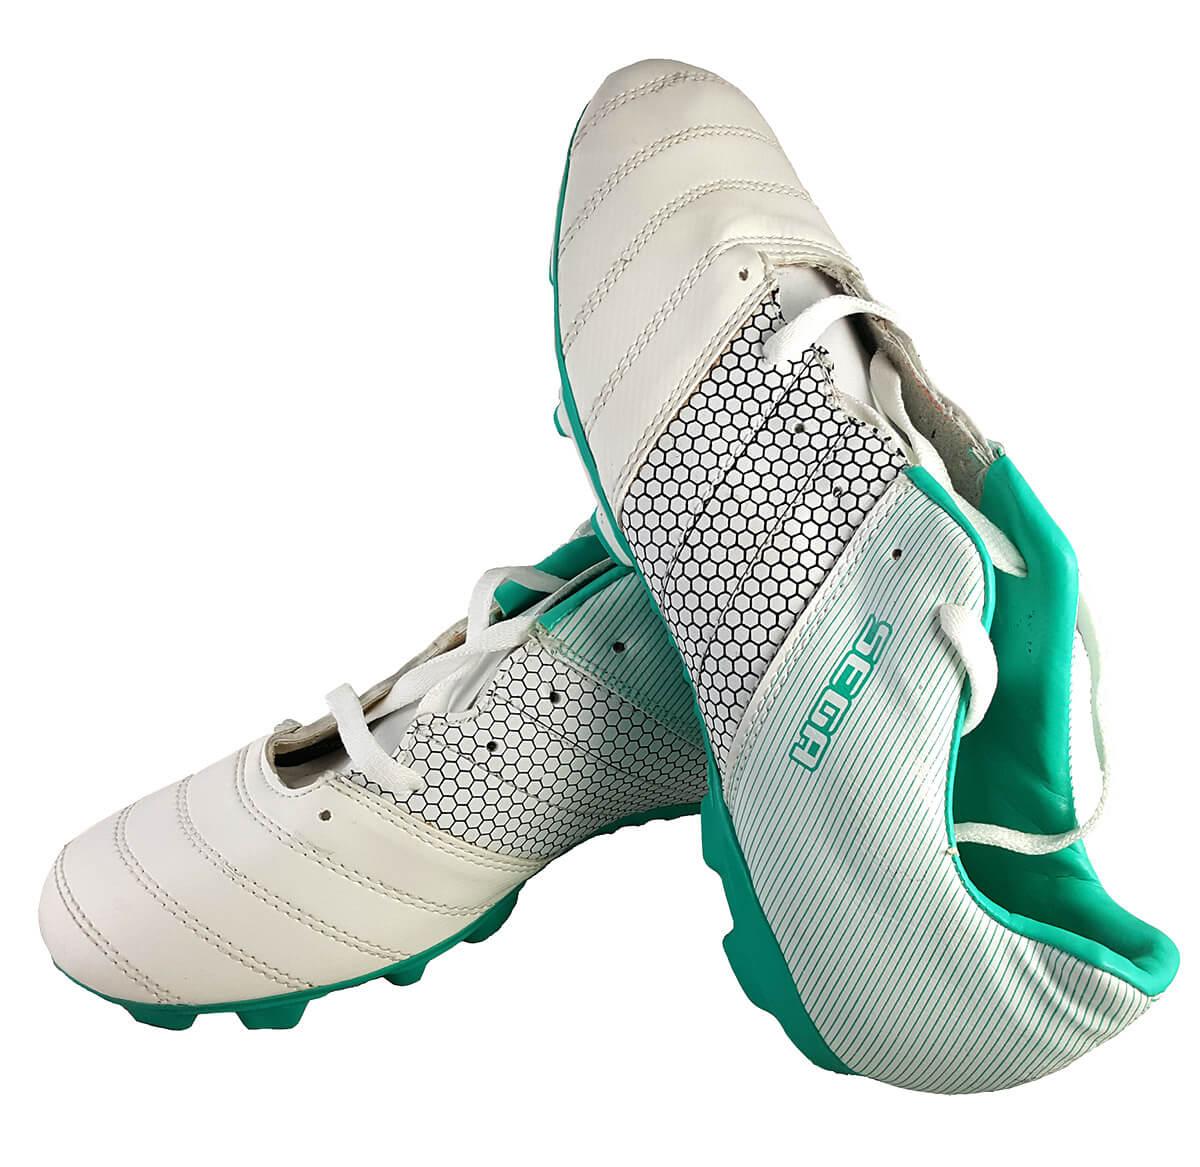 Sega Classic Football Studs Shoes